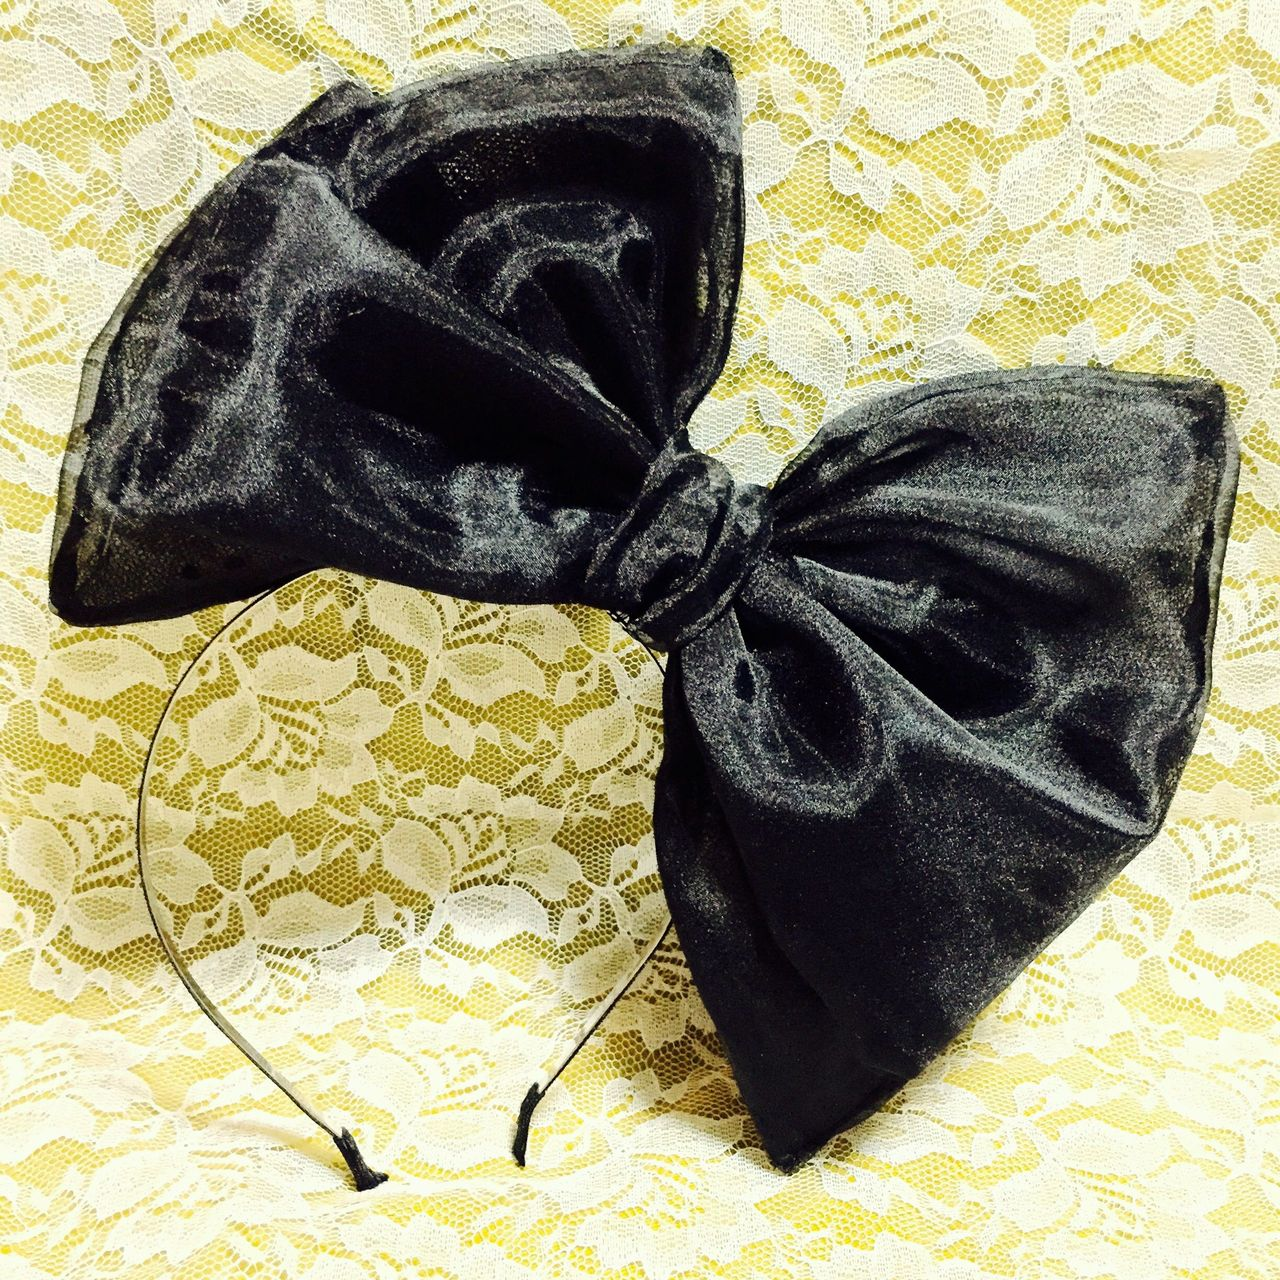 b00607150c04e ♡大きいリボンの作り方♡ハロウィンイベントや衣装のアクセサリー作りに ...